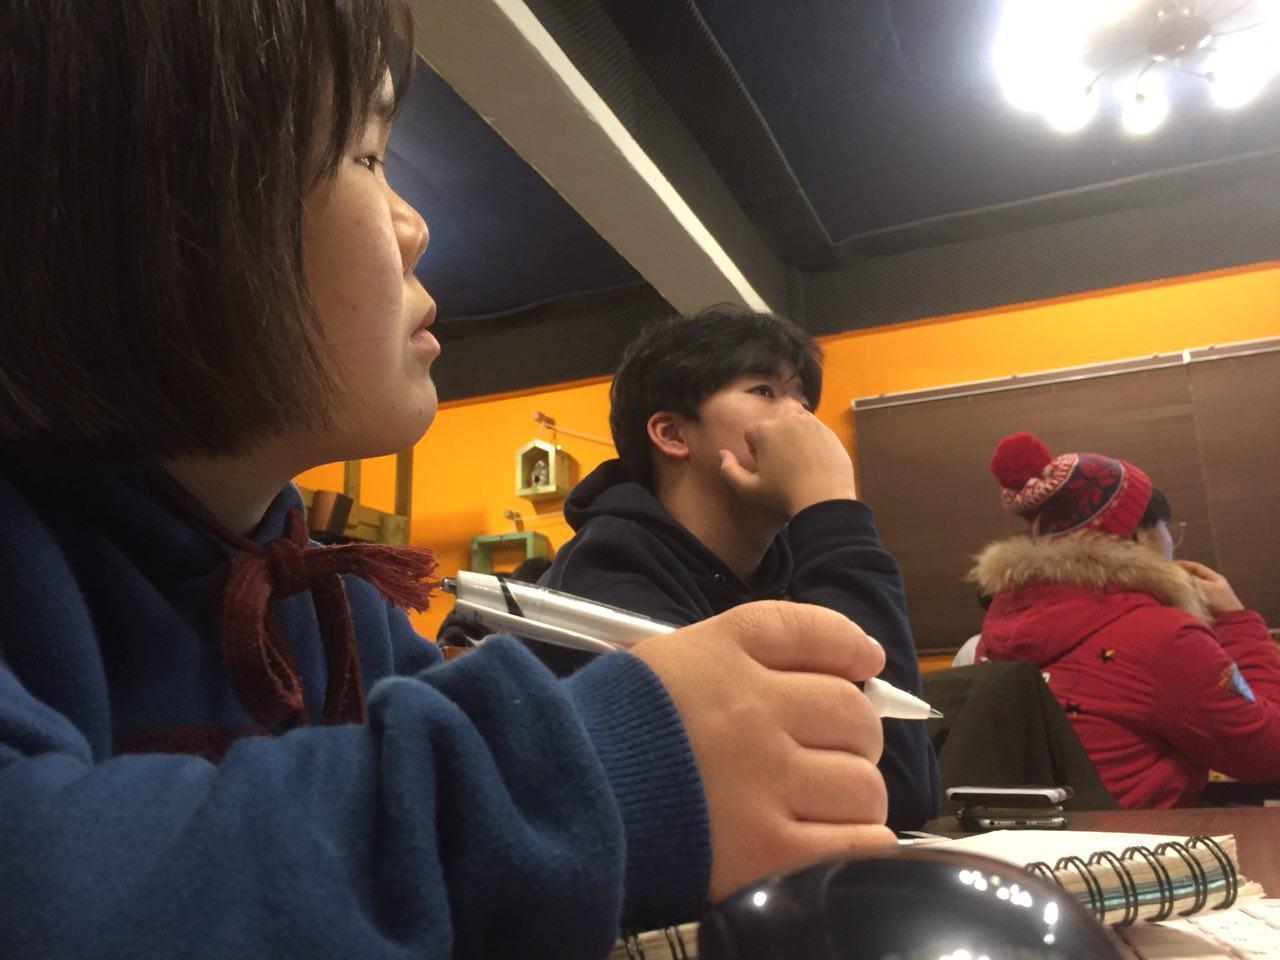 photo_2018-01-16_20-08-18.jpg